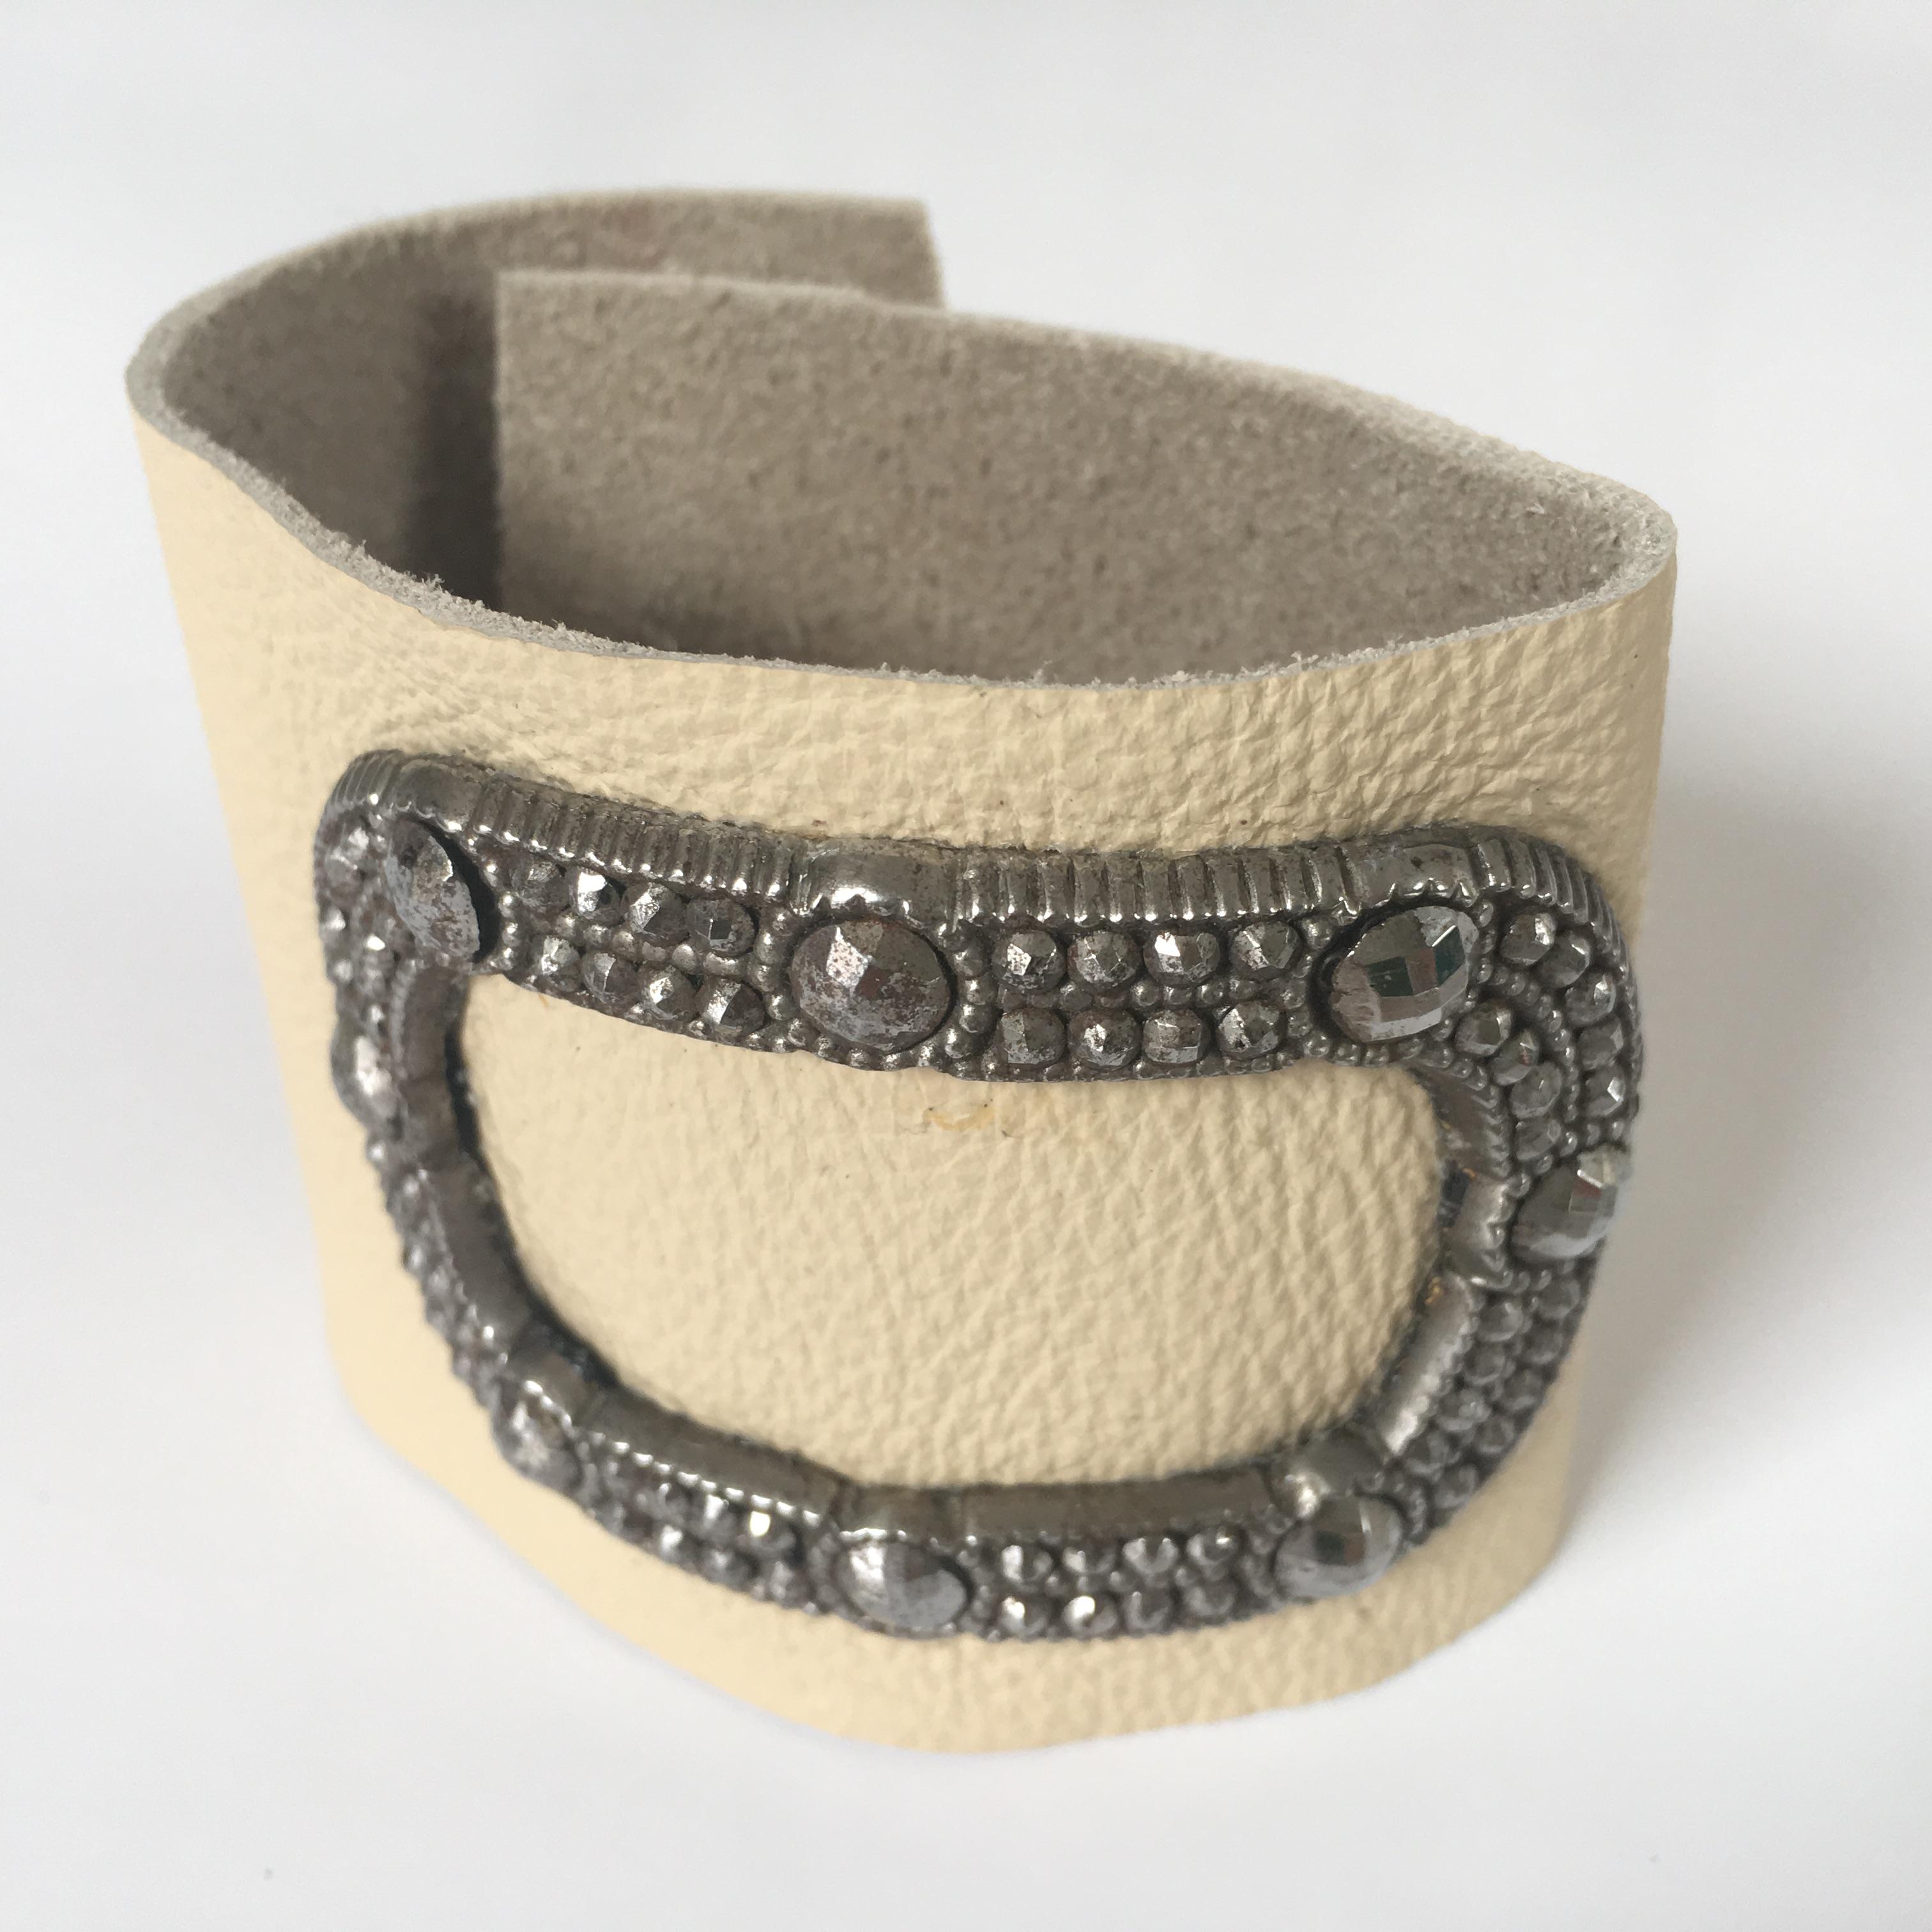 Shoe buckle cuff